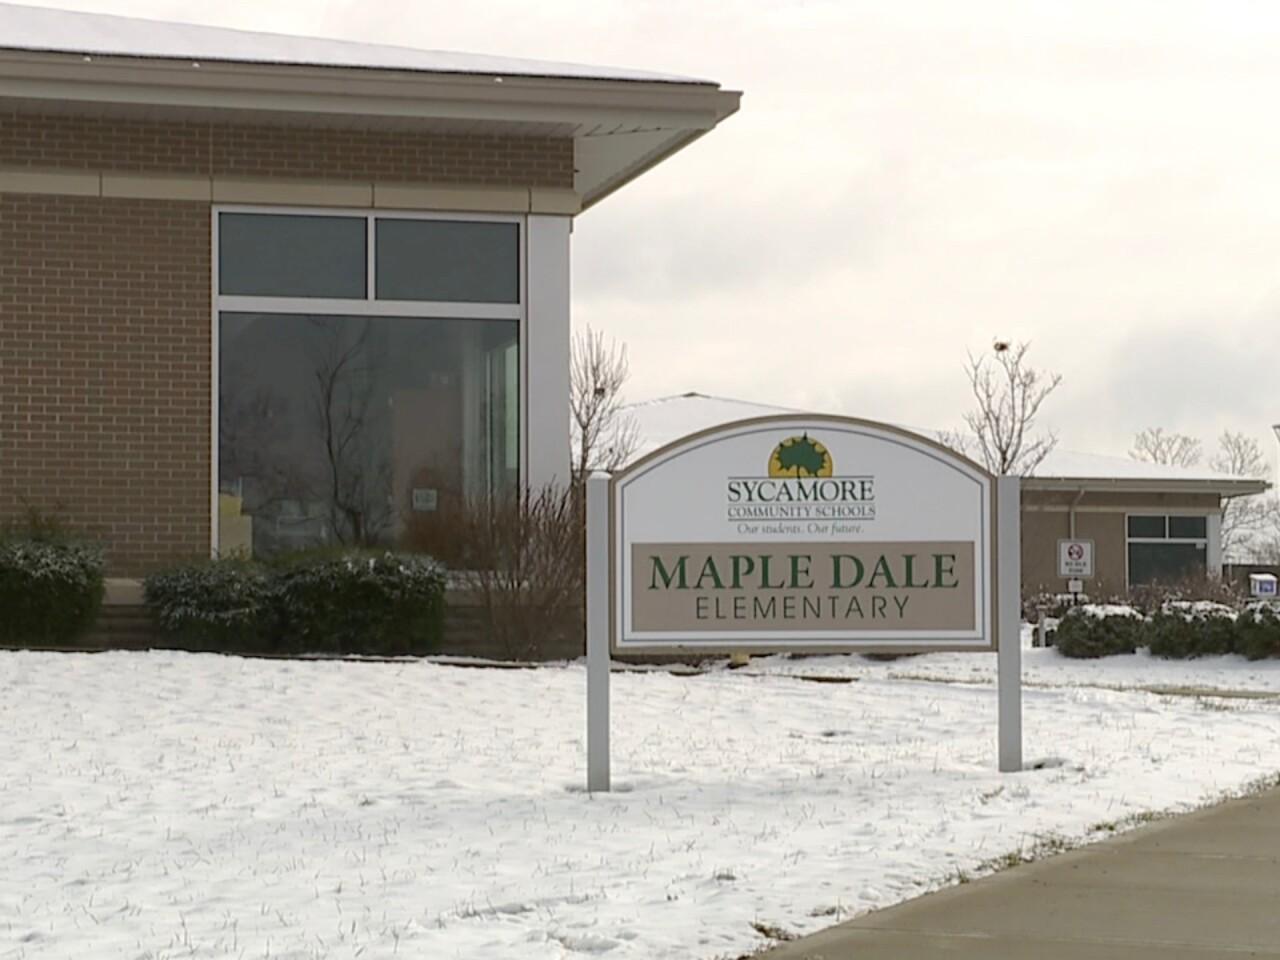 Maple_Dale_Elementary.jpg